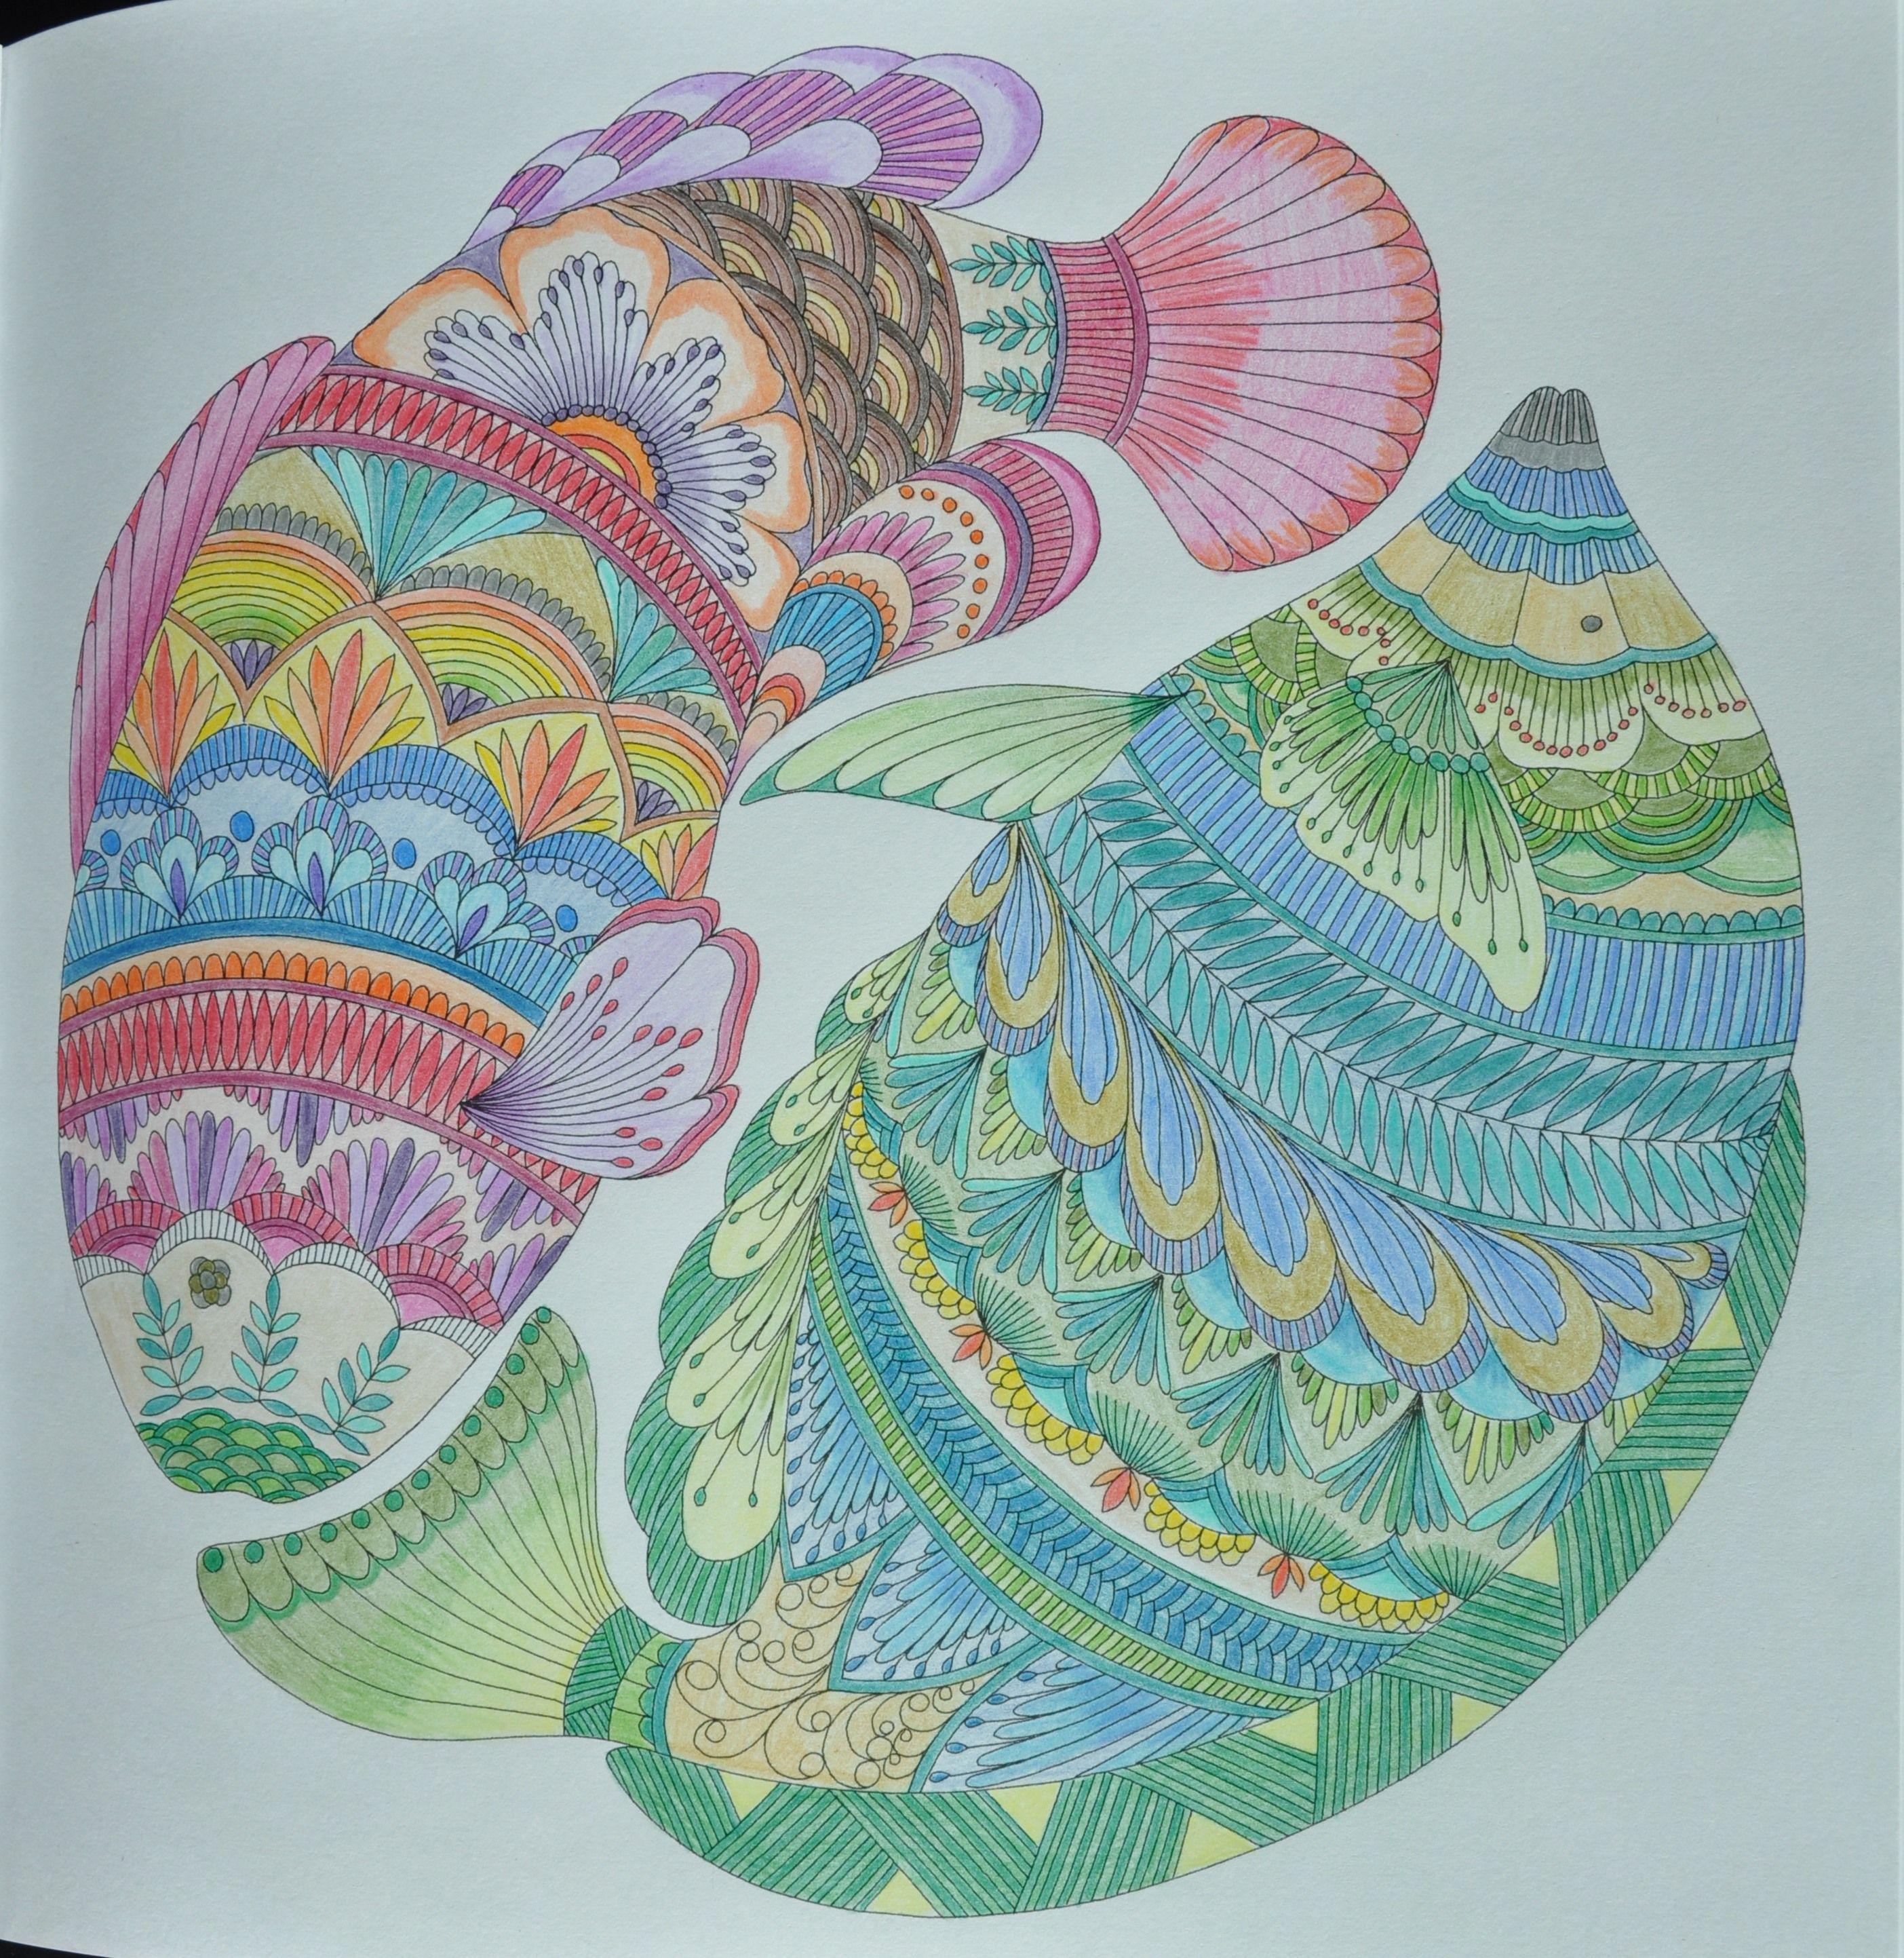 Reino Animal de Millie Marotta | Book coloring | Pinterest | Animal ...